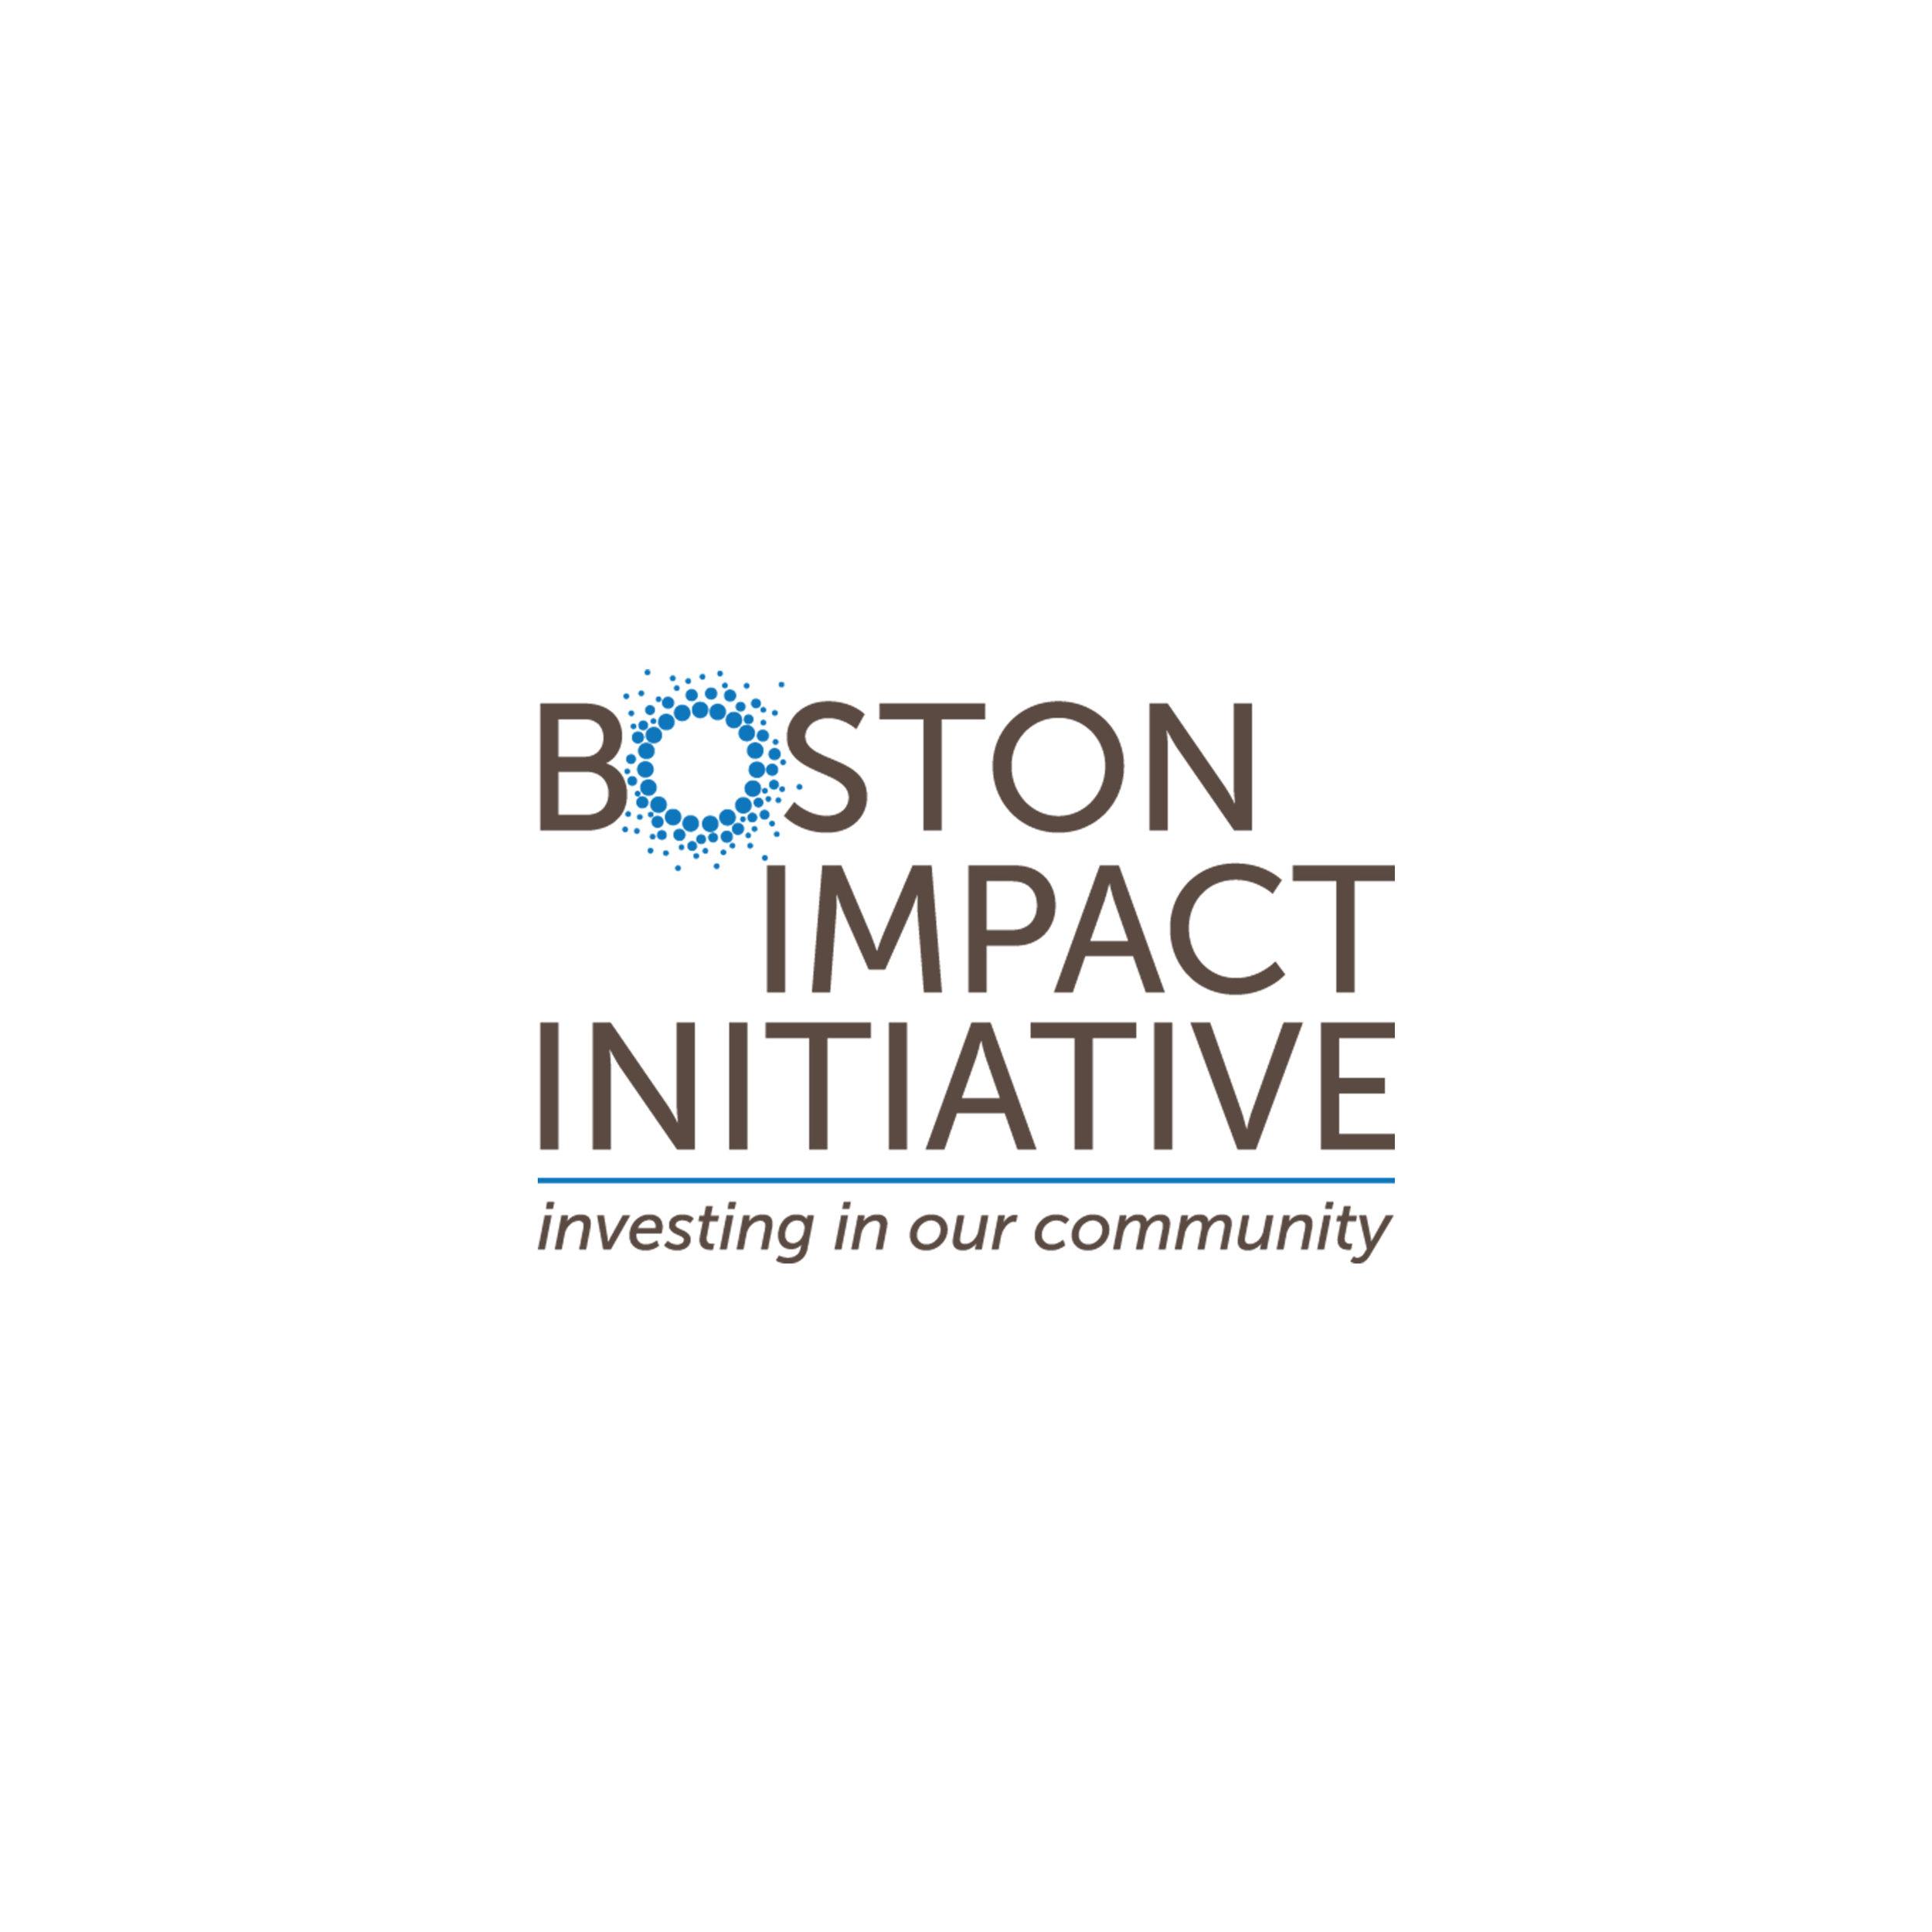 SS Boston Impact .jpg